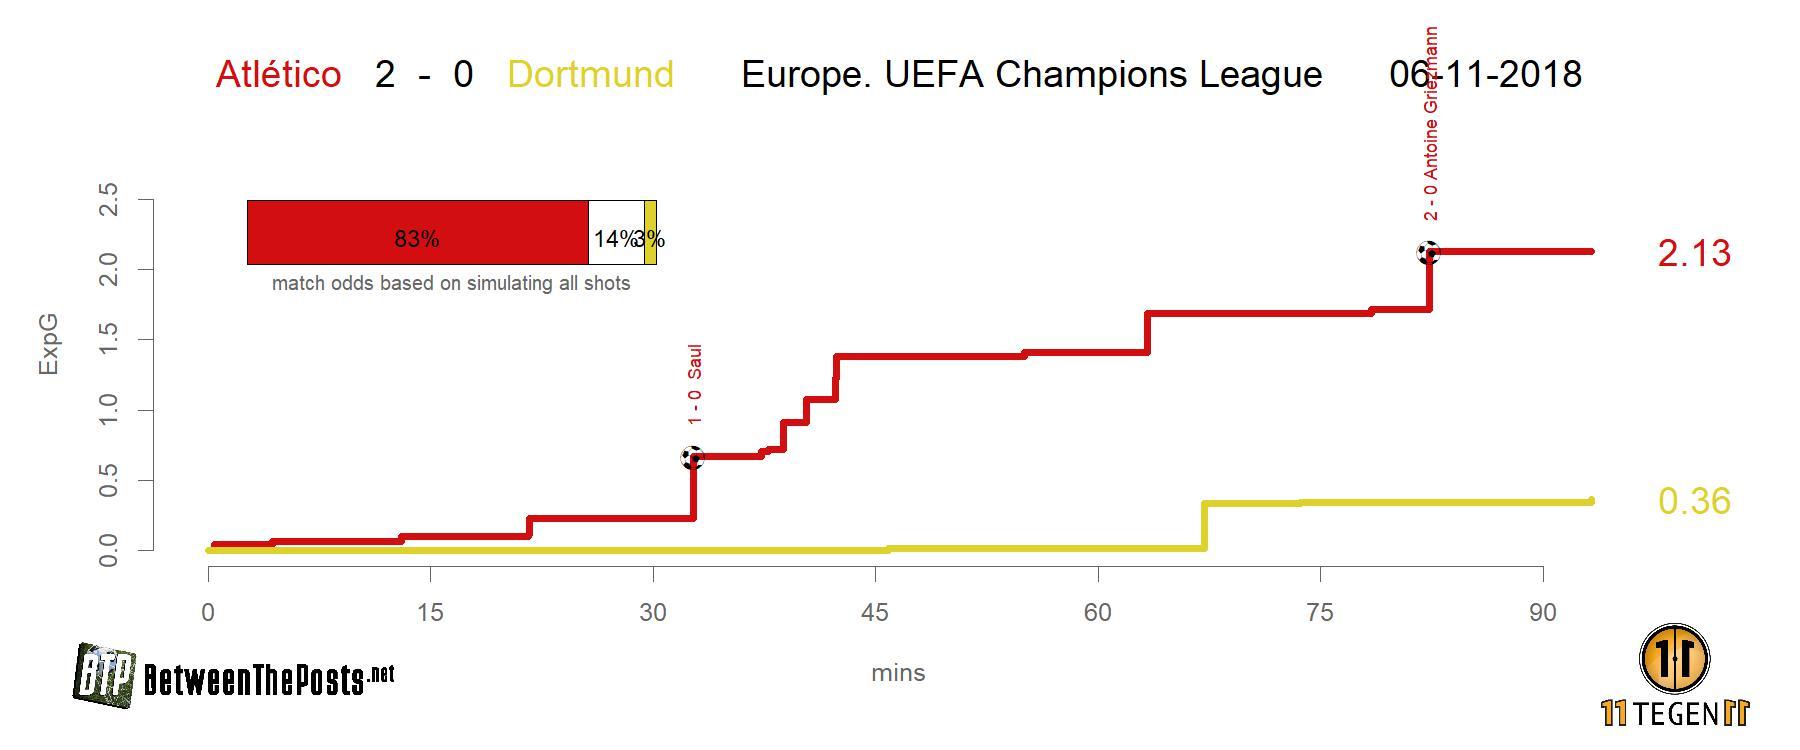 Expected goals plot Atlético Dortmund 2-0